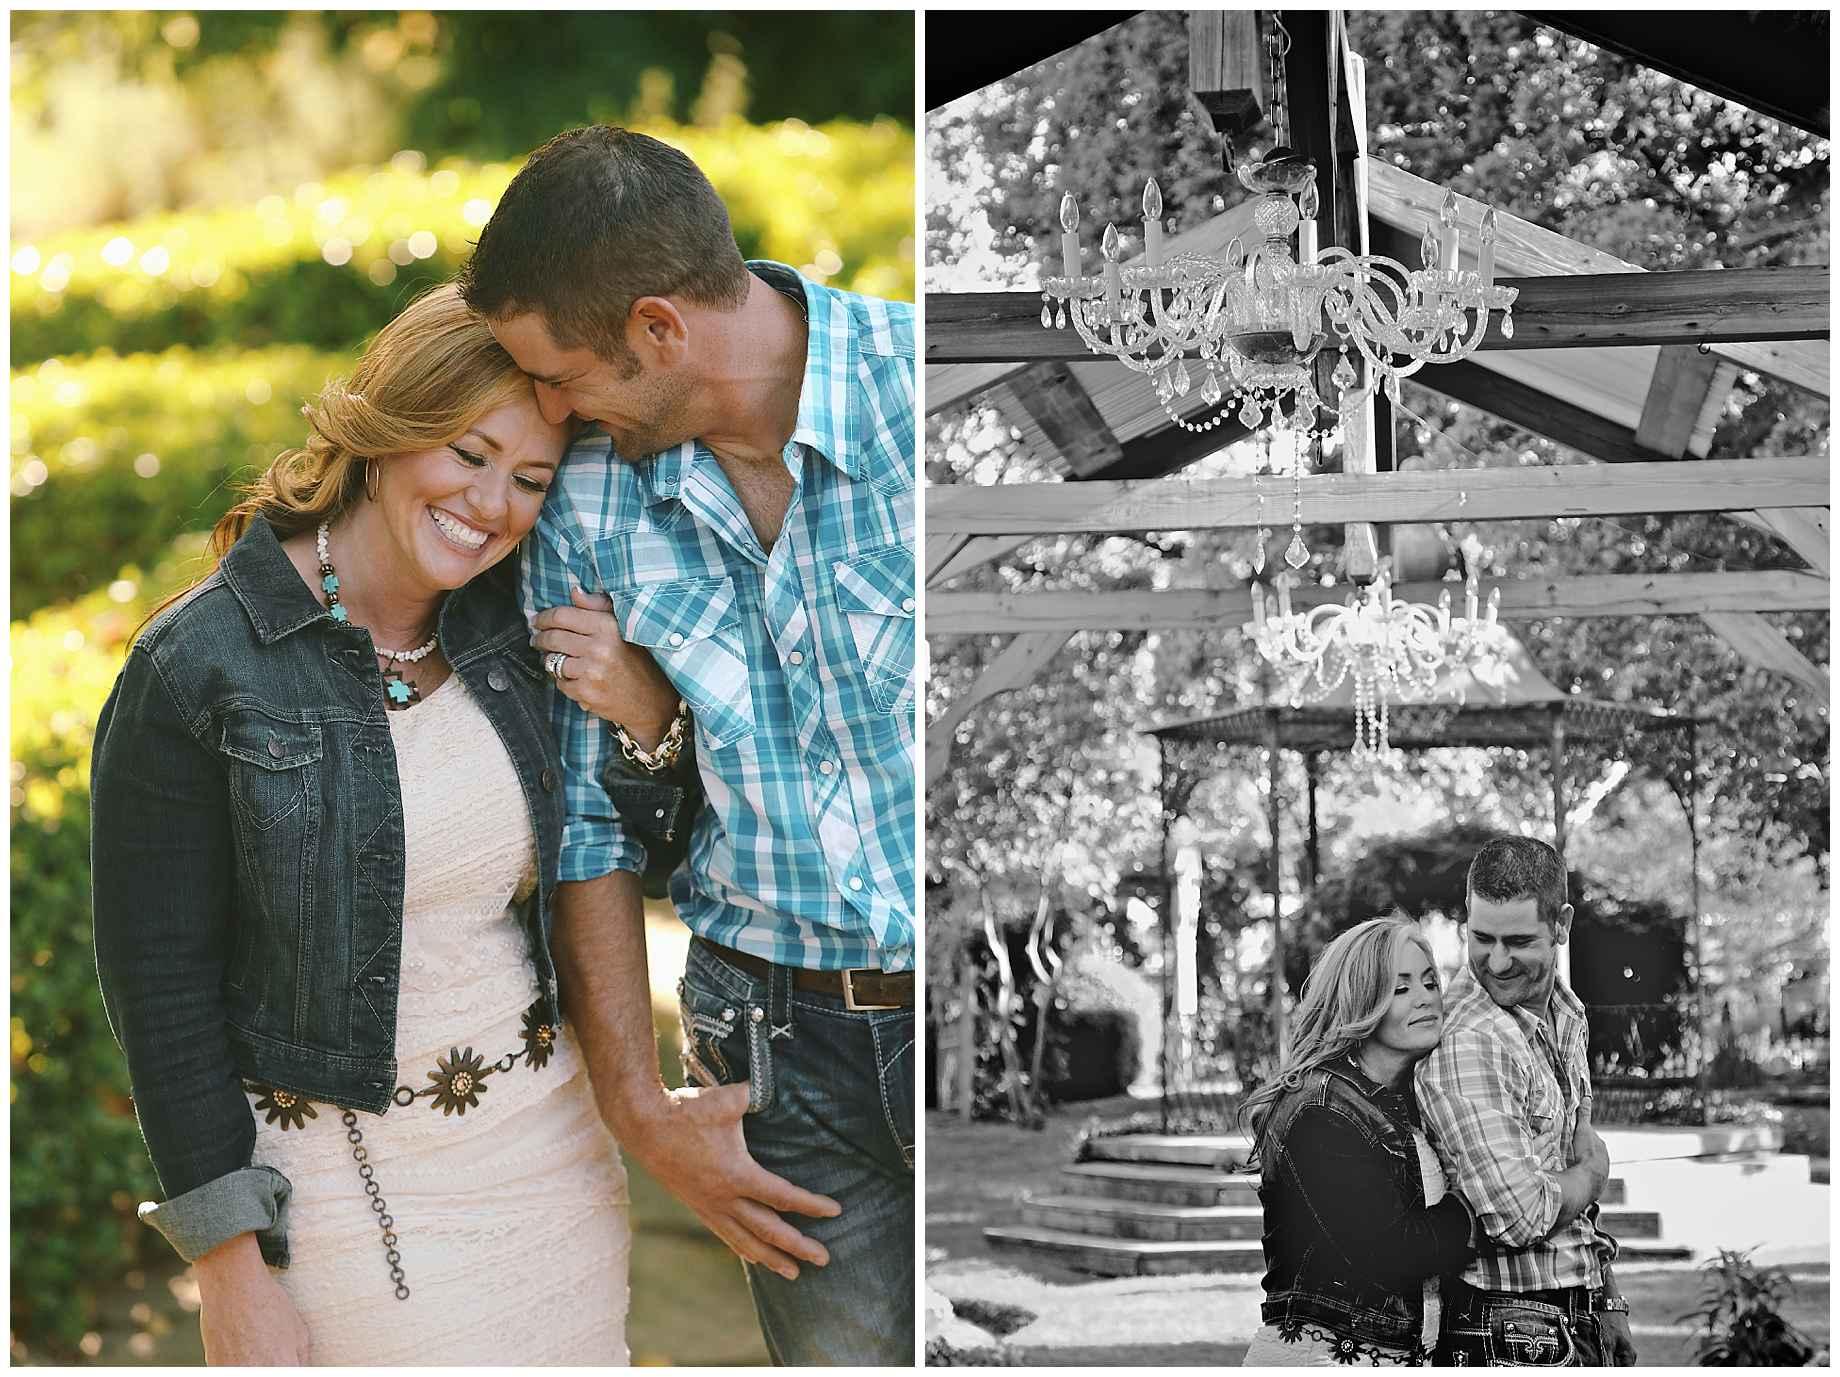 east-texas-engagement-photos-05